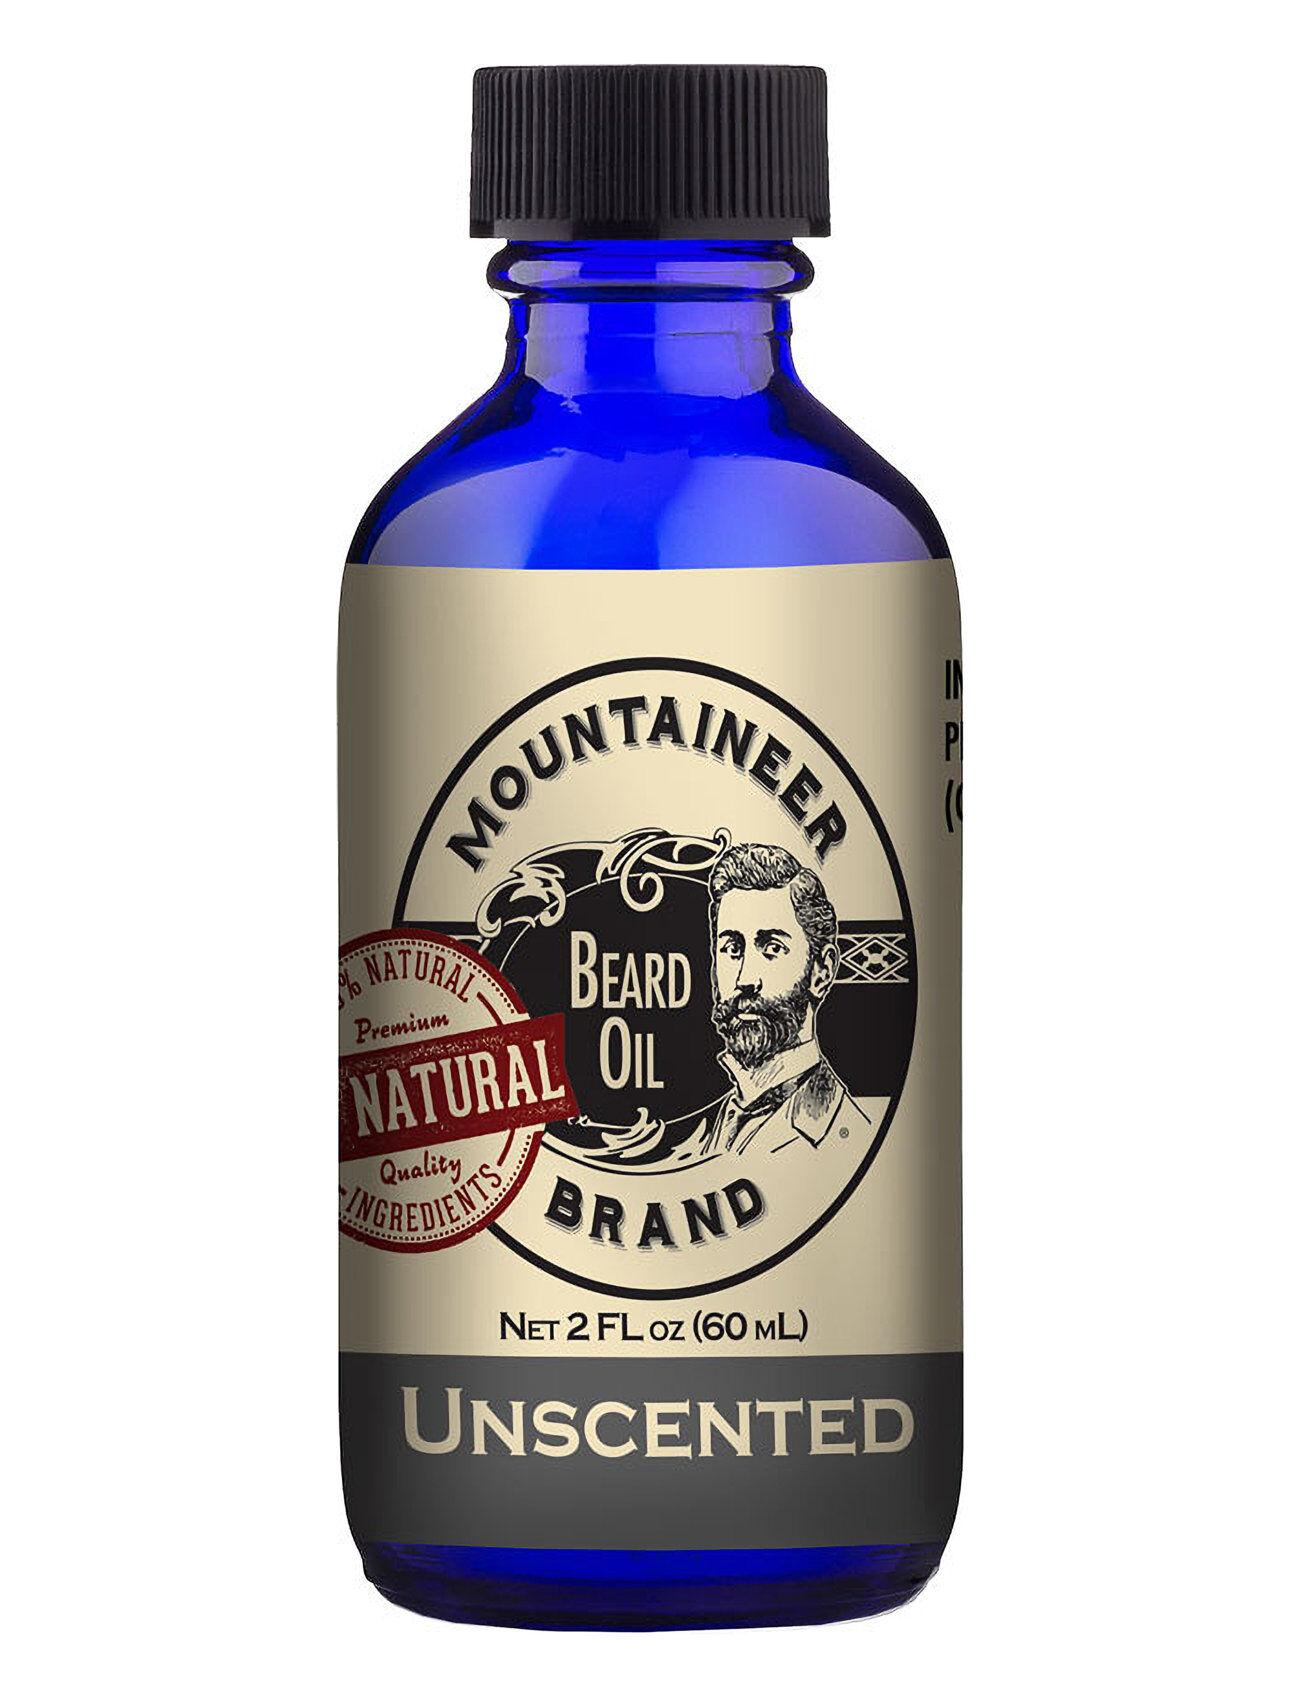 Mountaineer Brand Barefoot Beard Oil